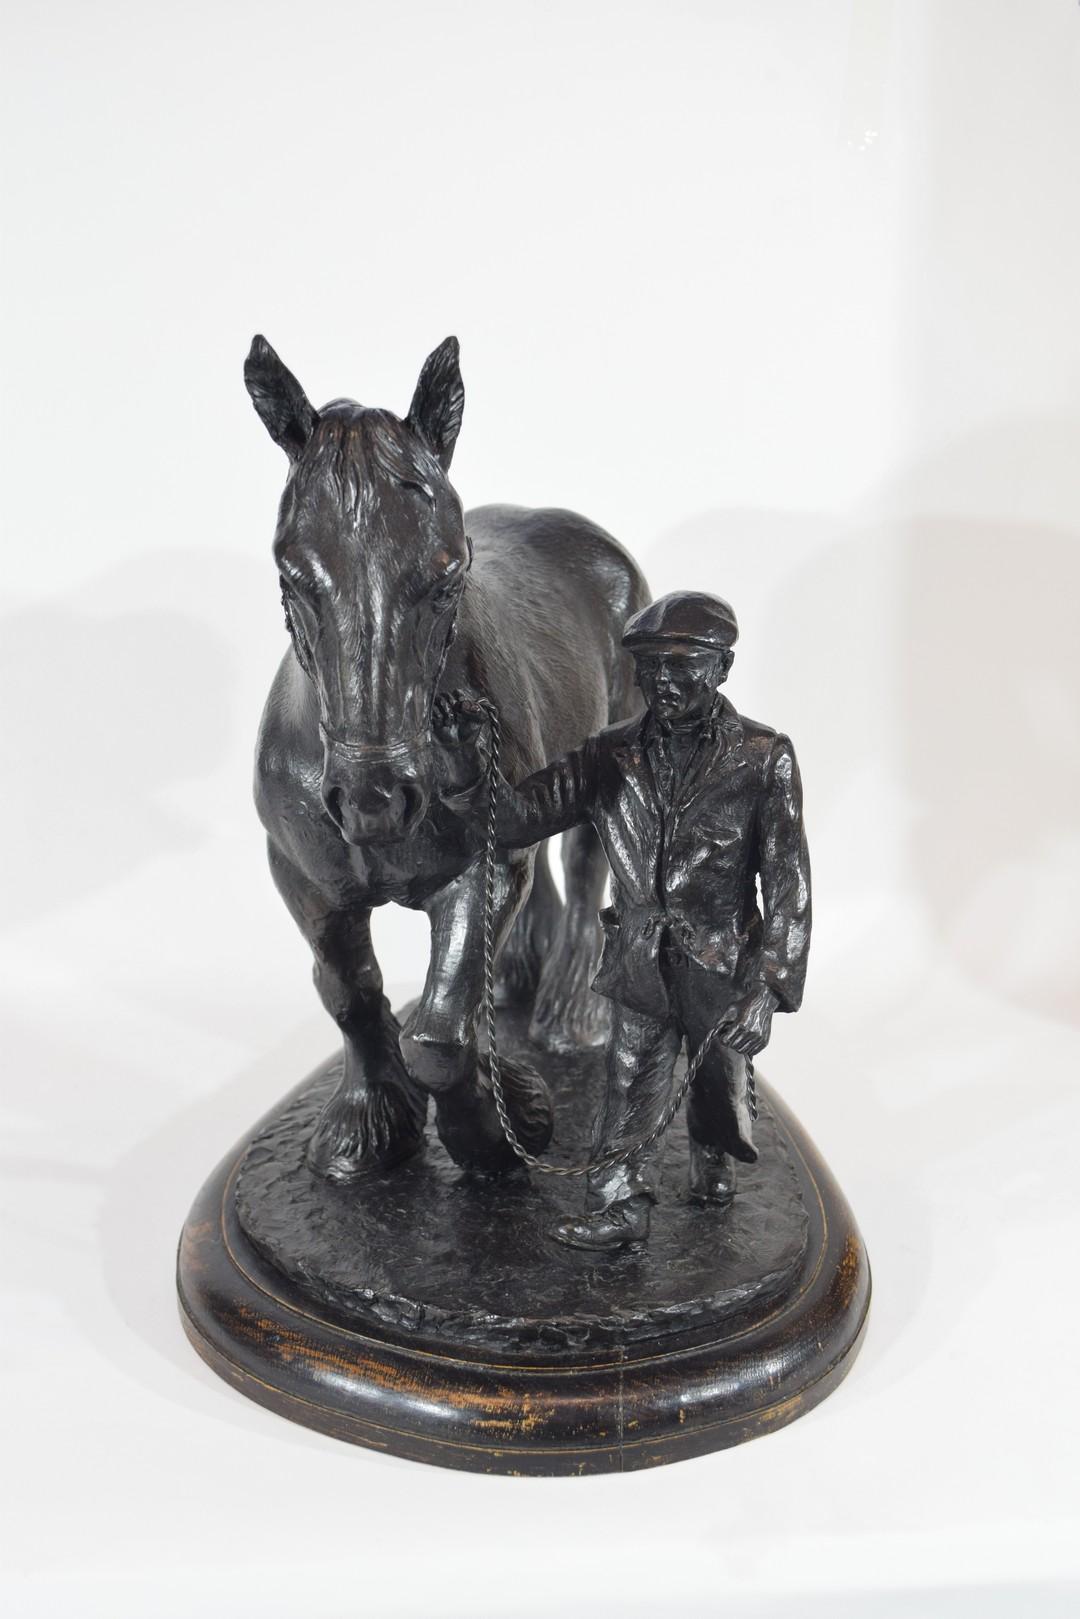 Brian Elton, bronzed resin figure 'The Ploughman' - Image 3 of 5